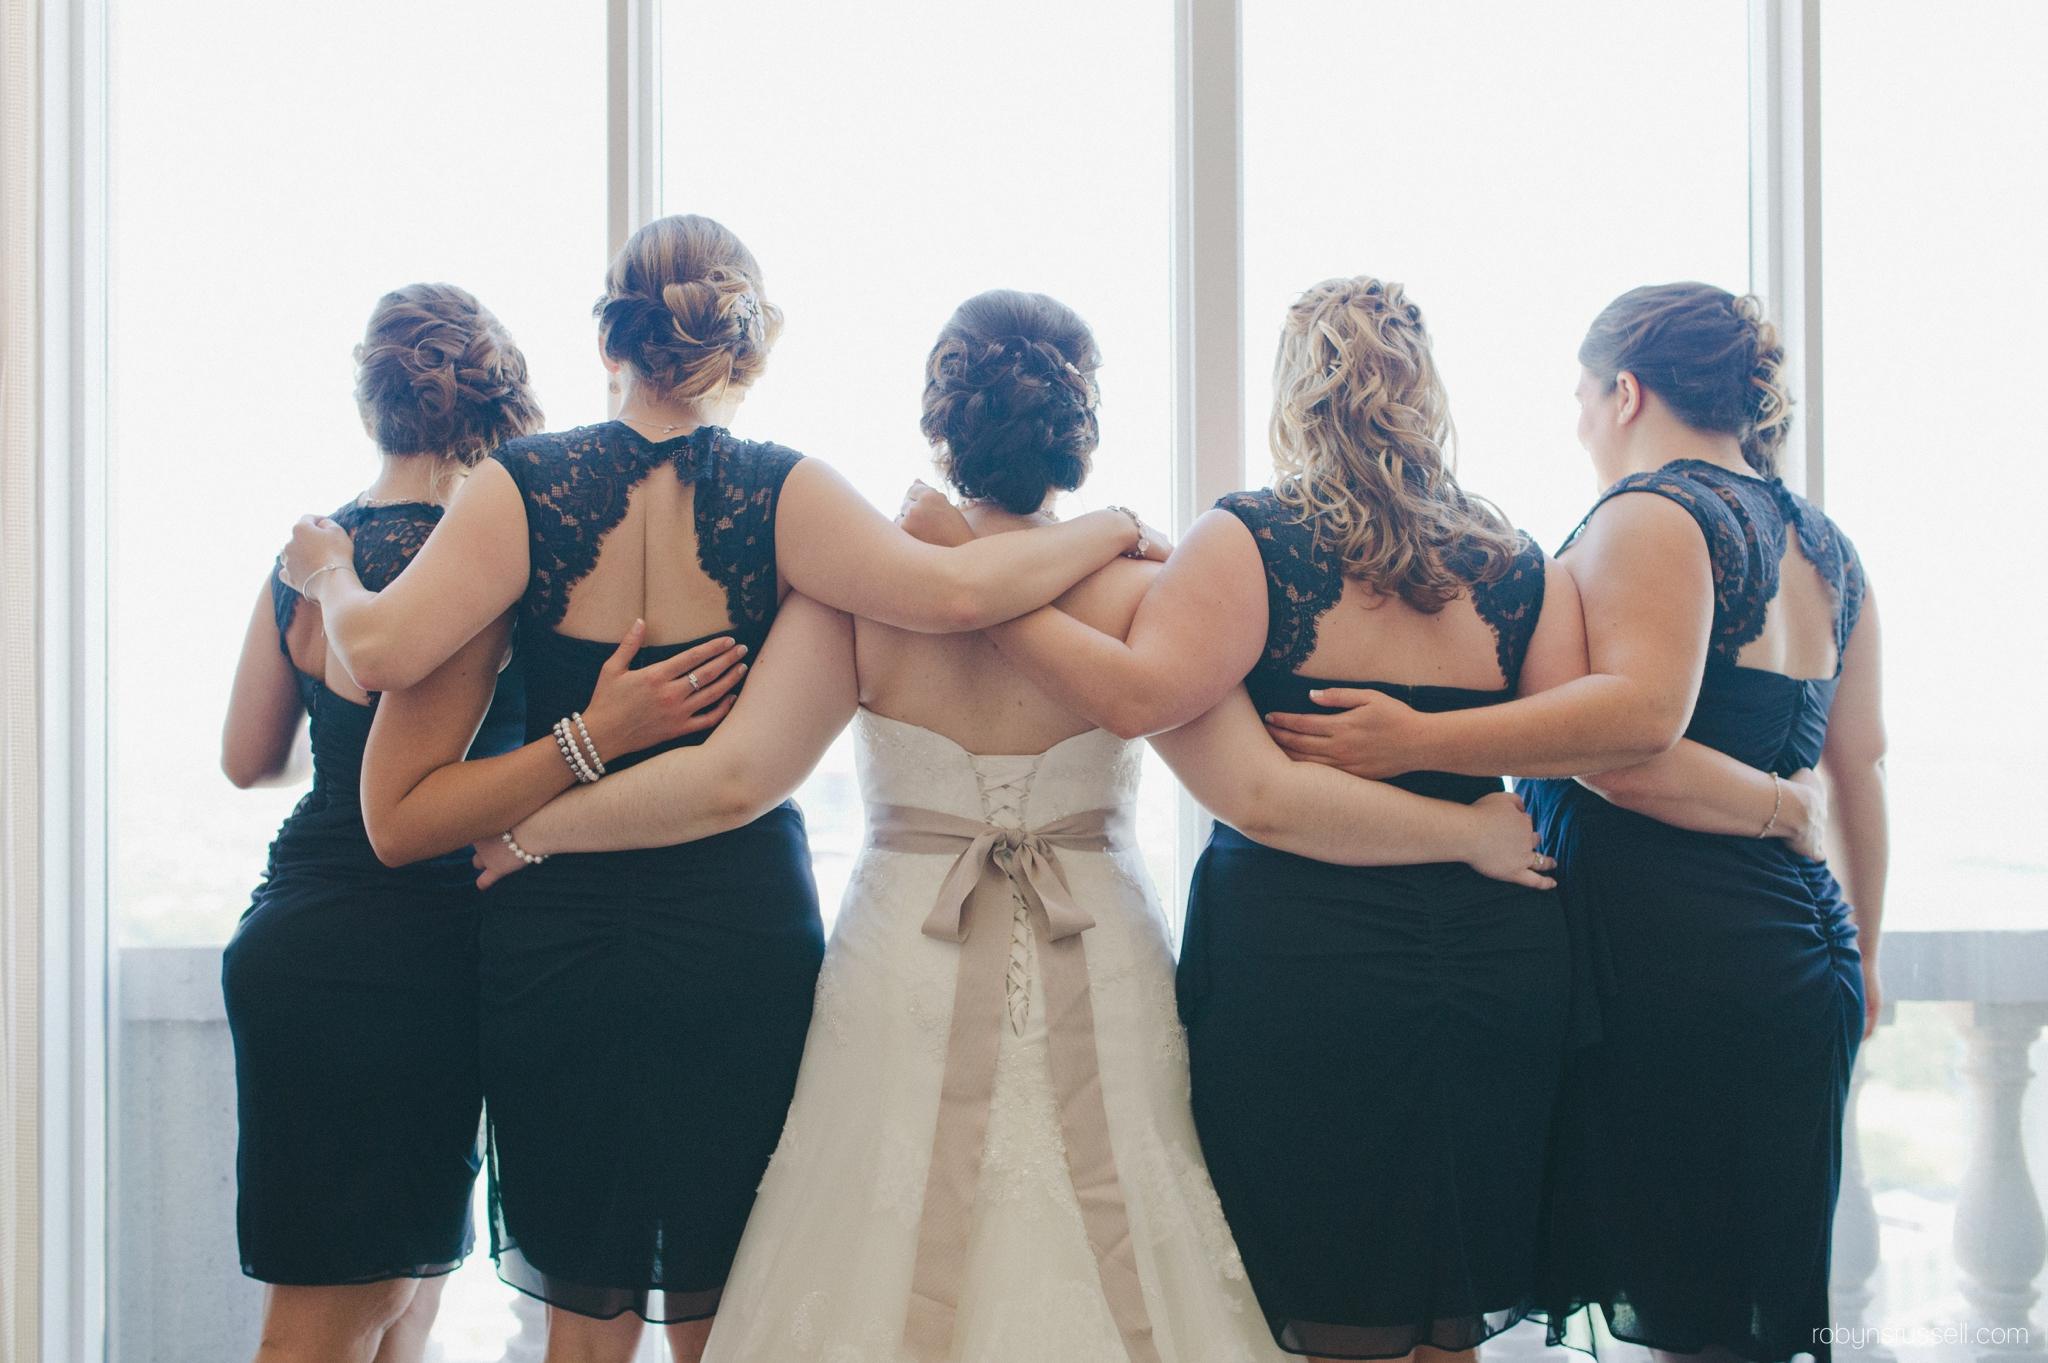 12-bride-and-bridesmaids.jpg